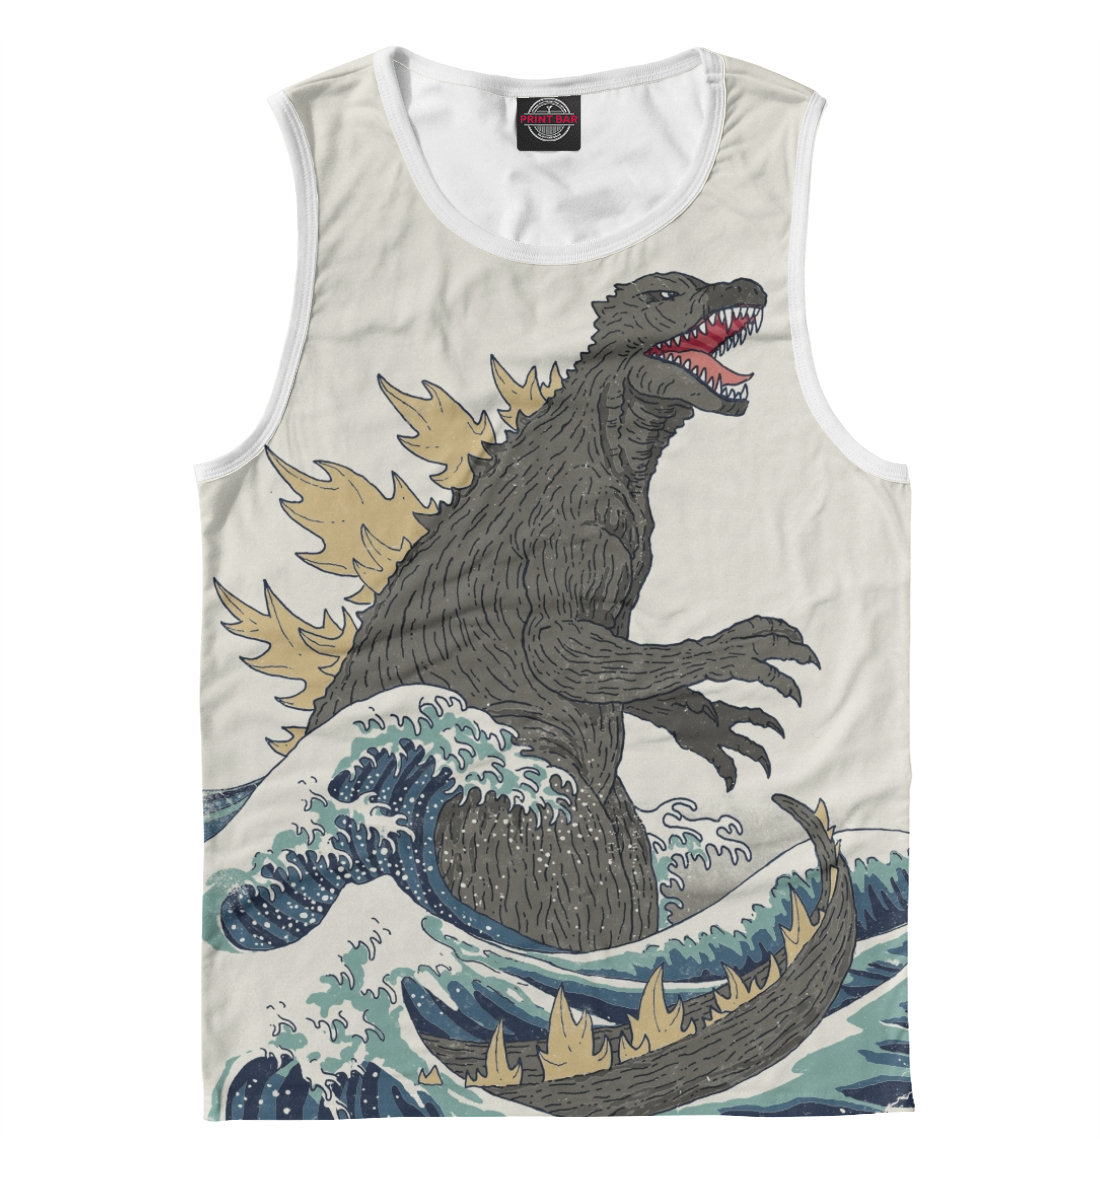 Купить Godzilla, Printbar, Майки, KNO-948120-may-2